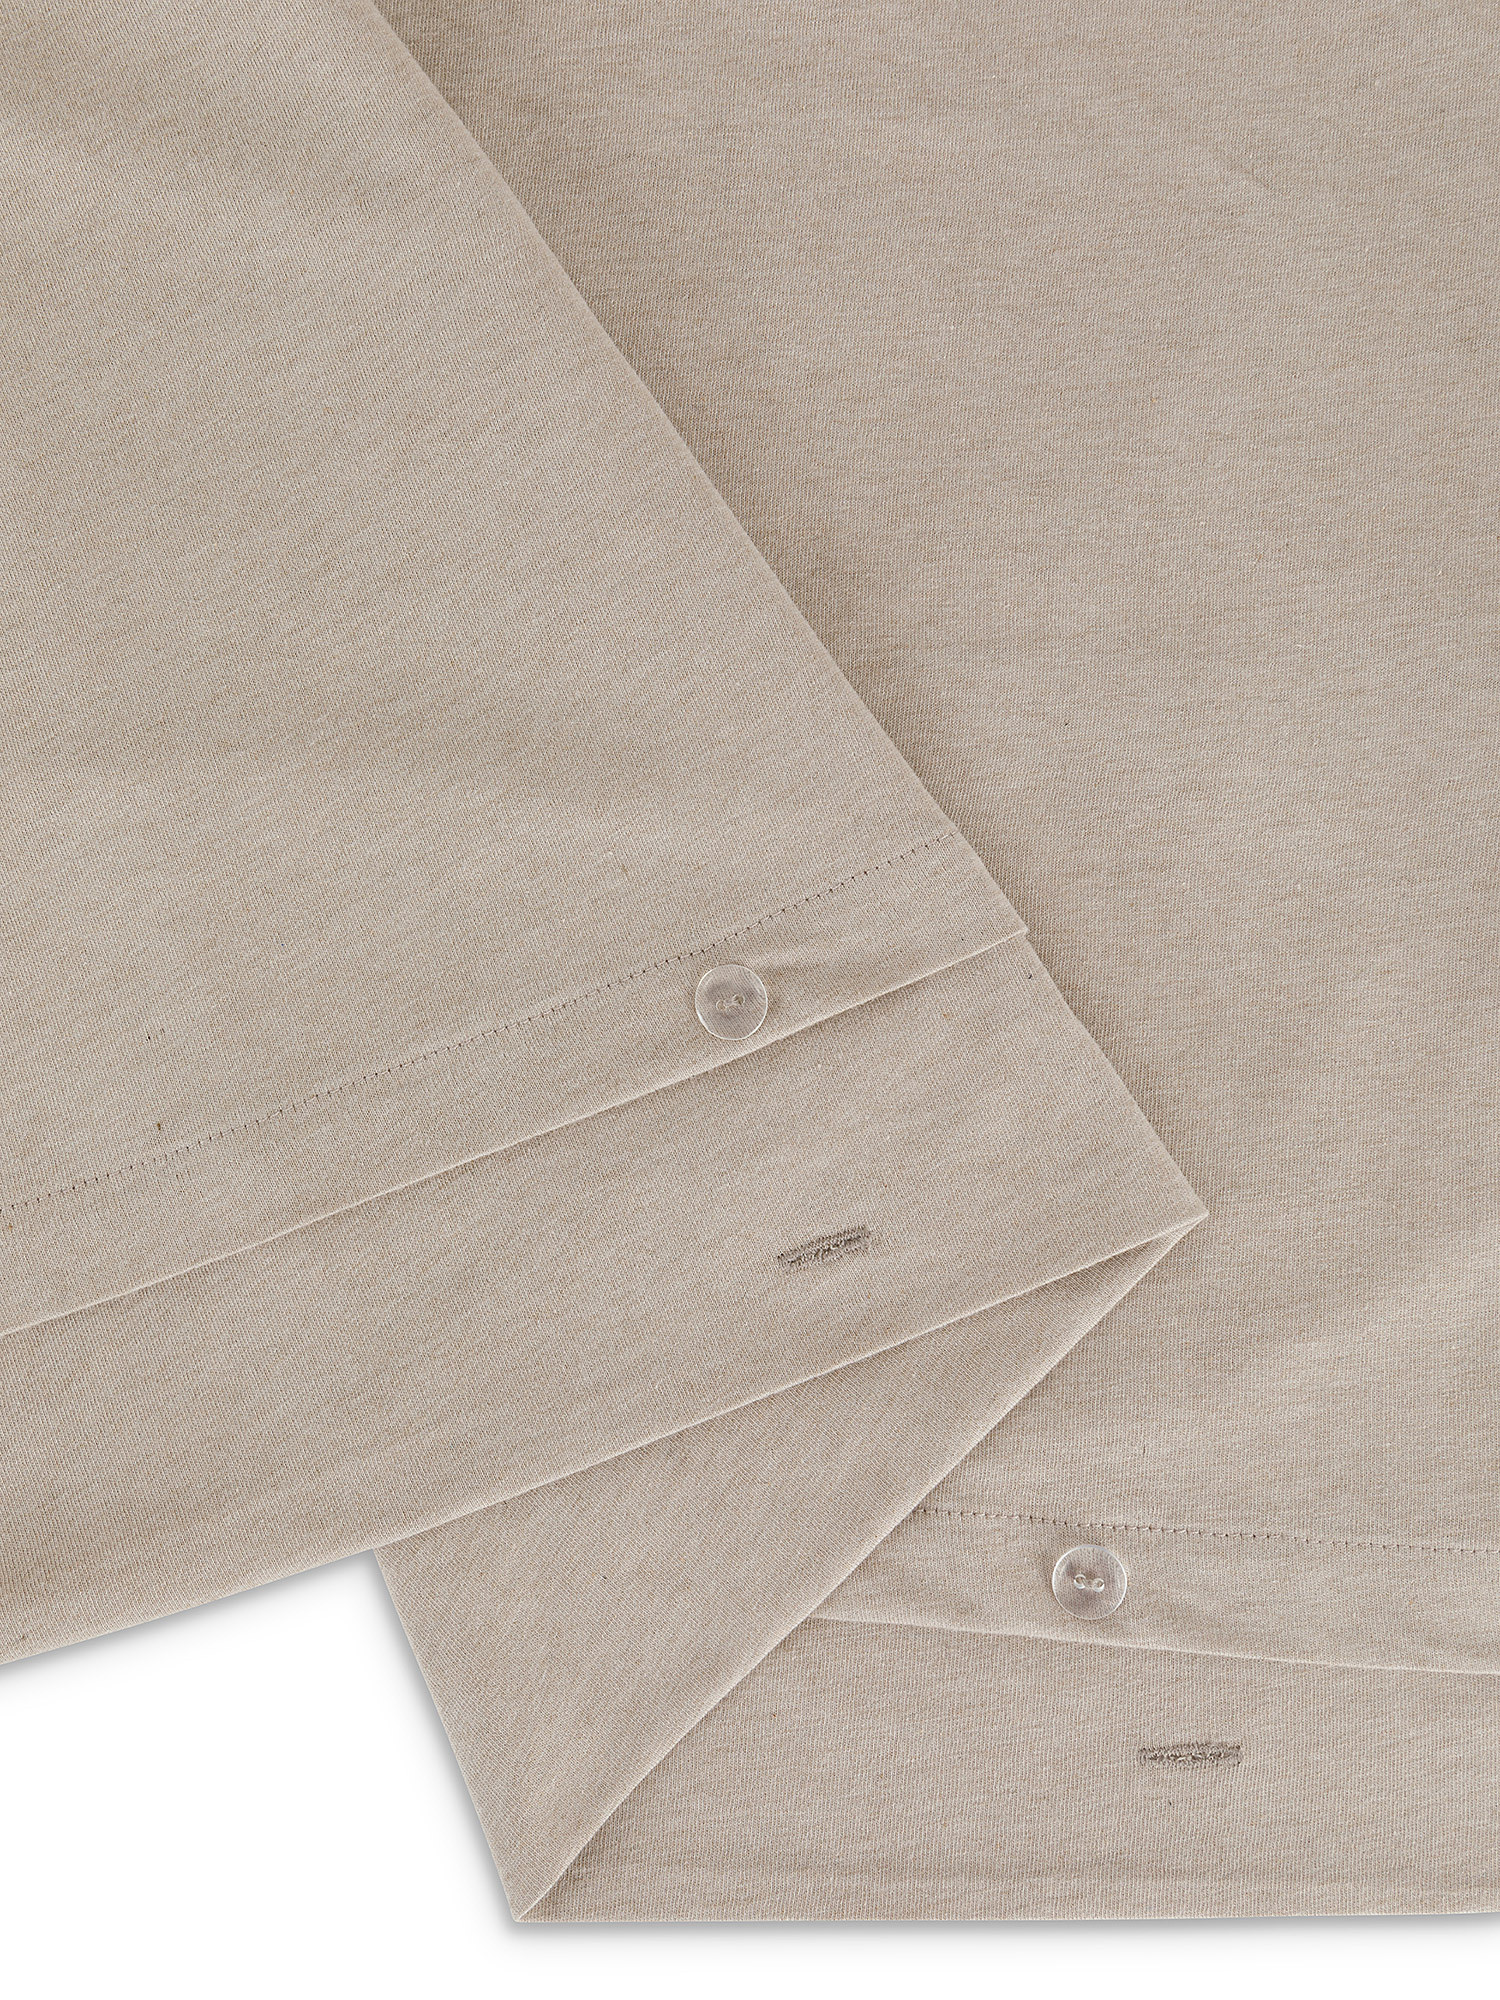 Parure copripiumino jersey di cotone tinta unita, Beige, large image number 1